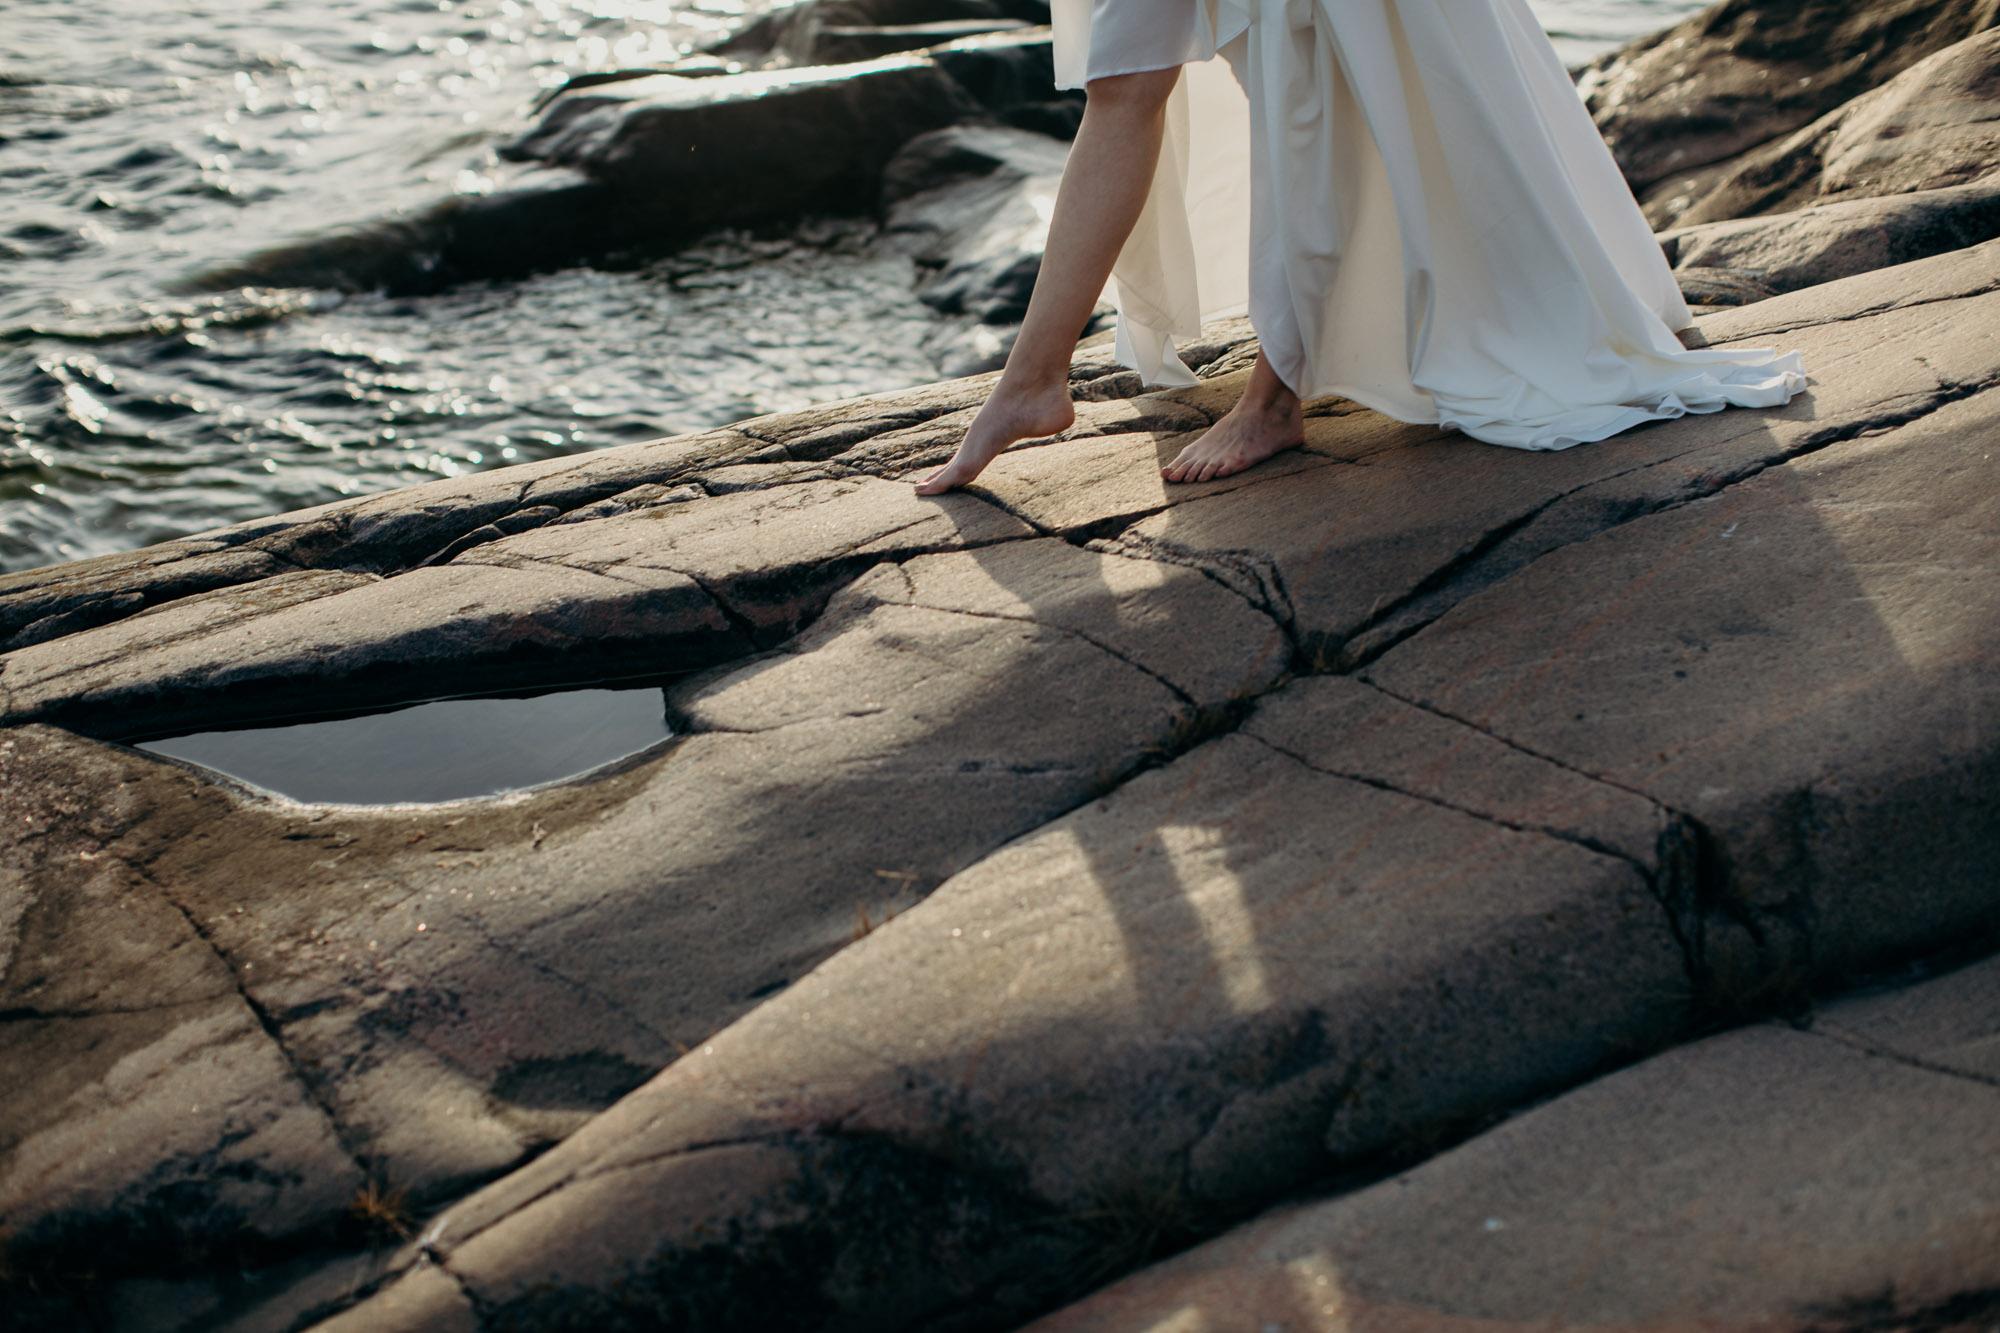 oro_weddings-jere_satamo-451.jpg